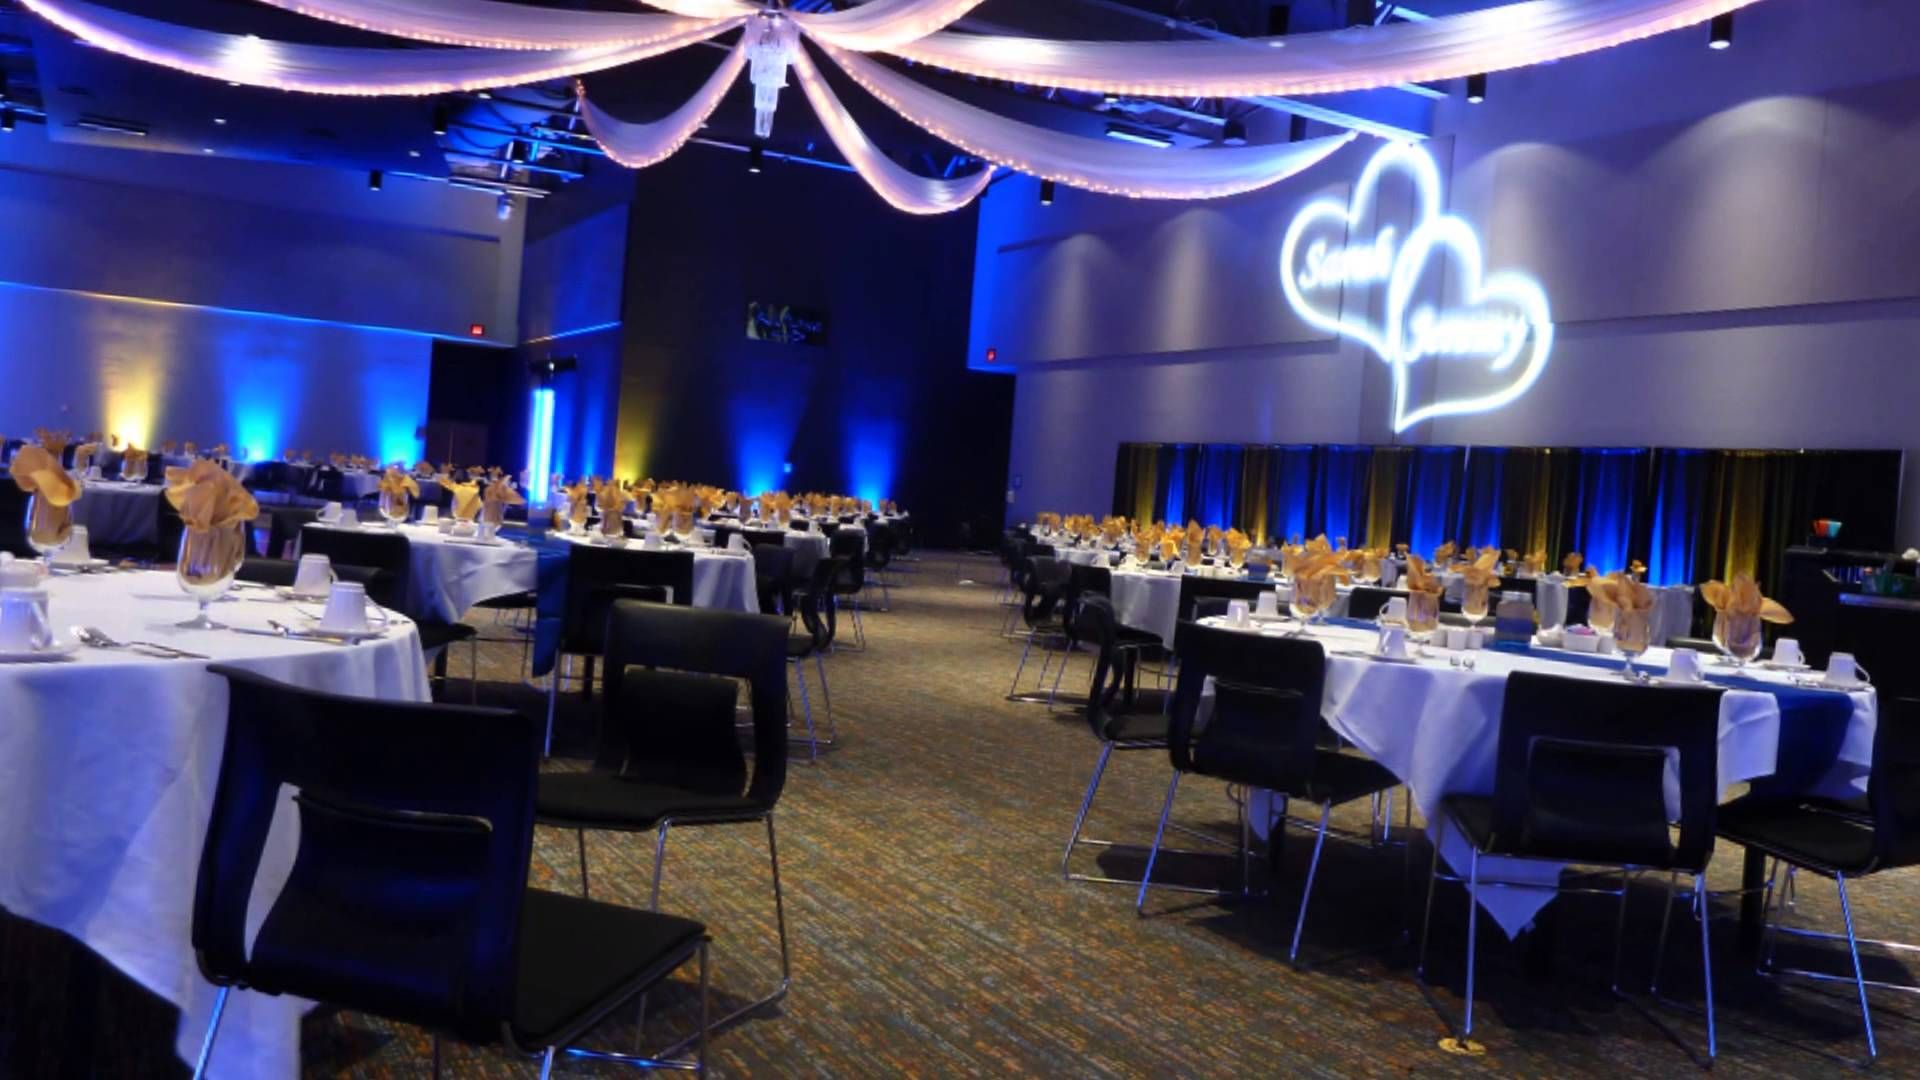 Image Result For Wedding Uplighting Navy Gold Uplighting Wedding Uplighting Wedding